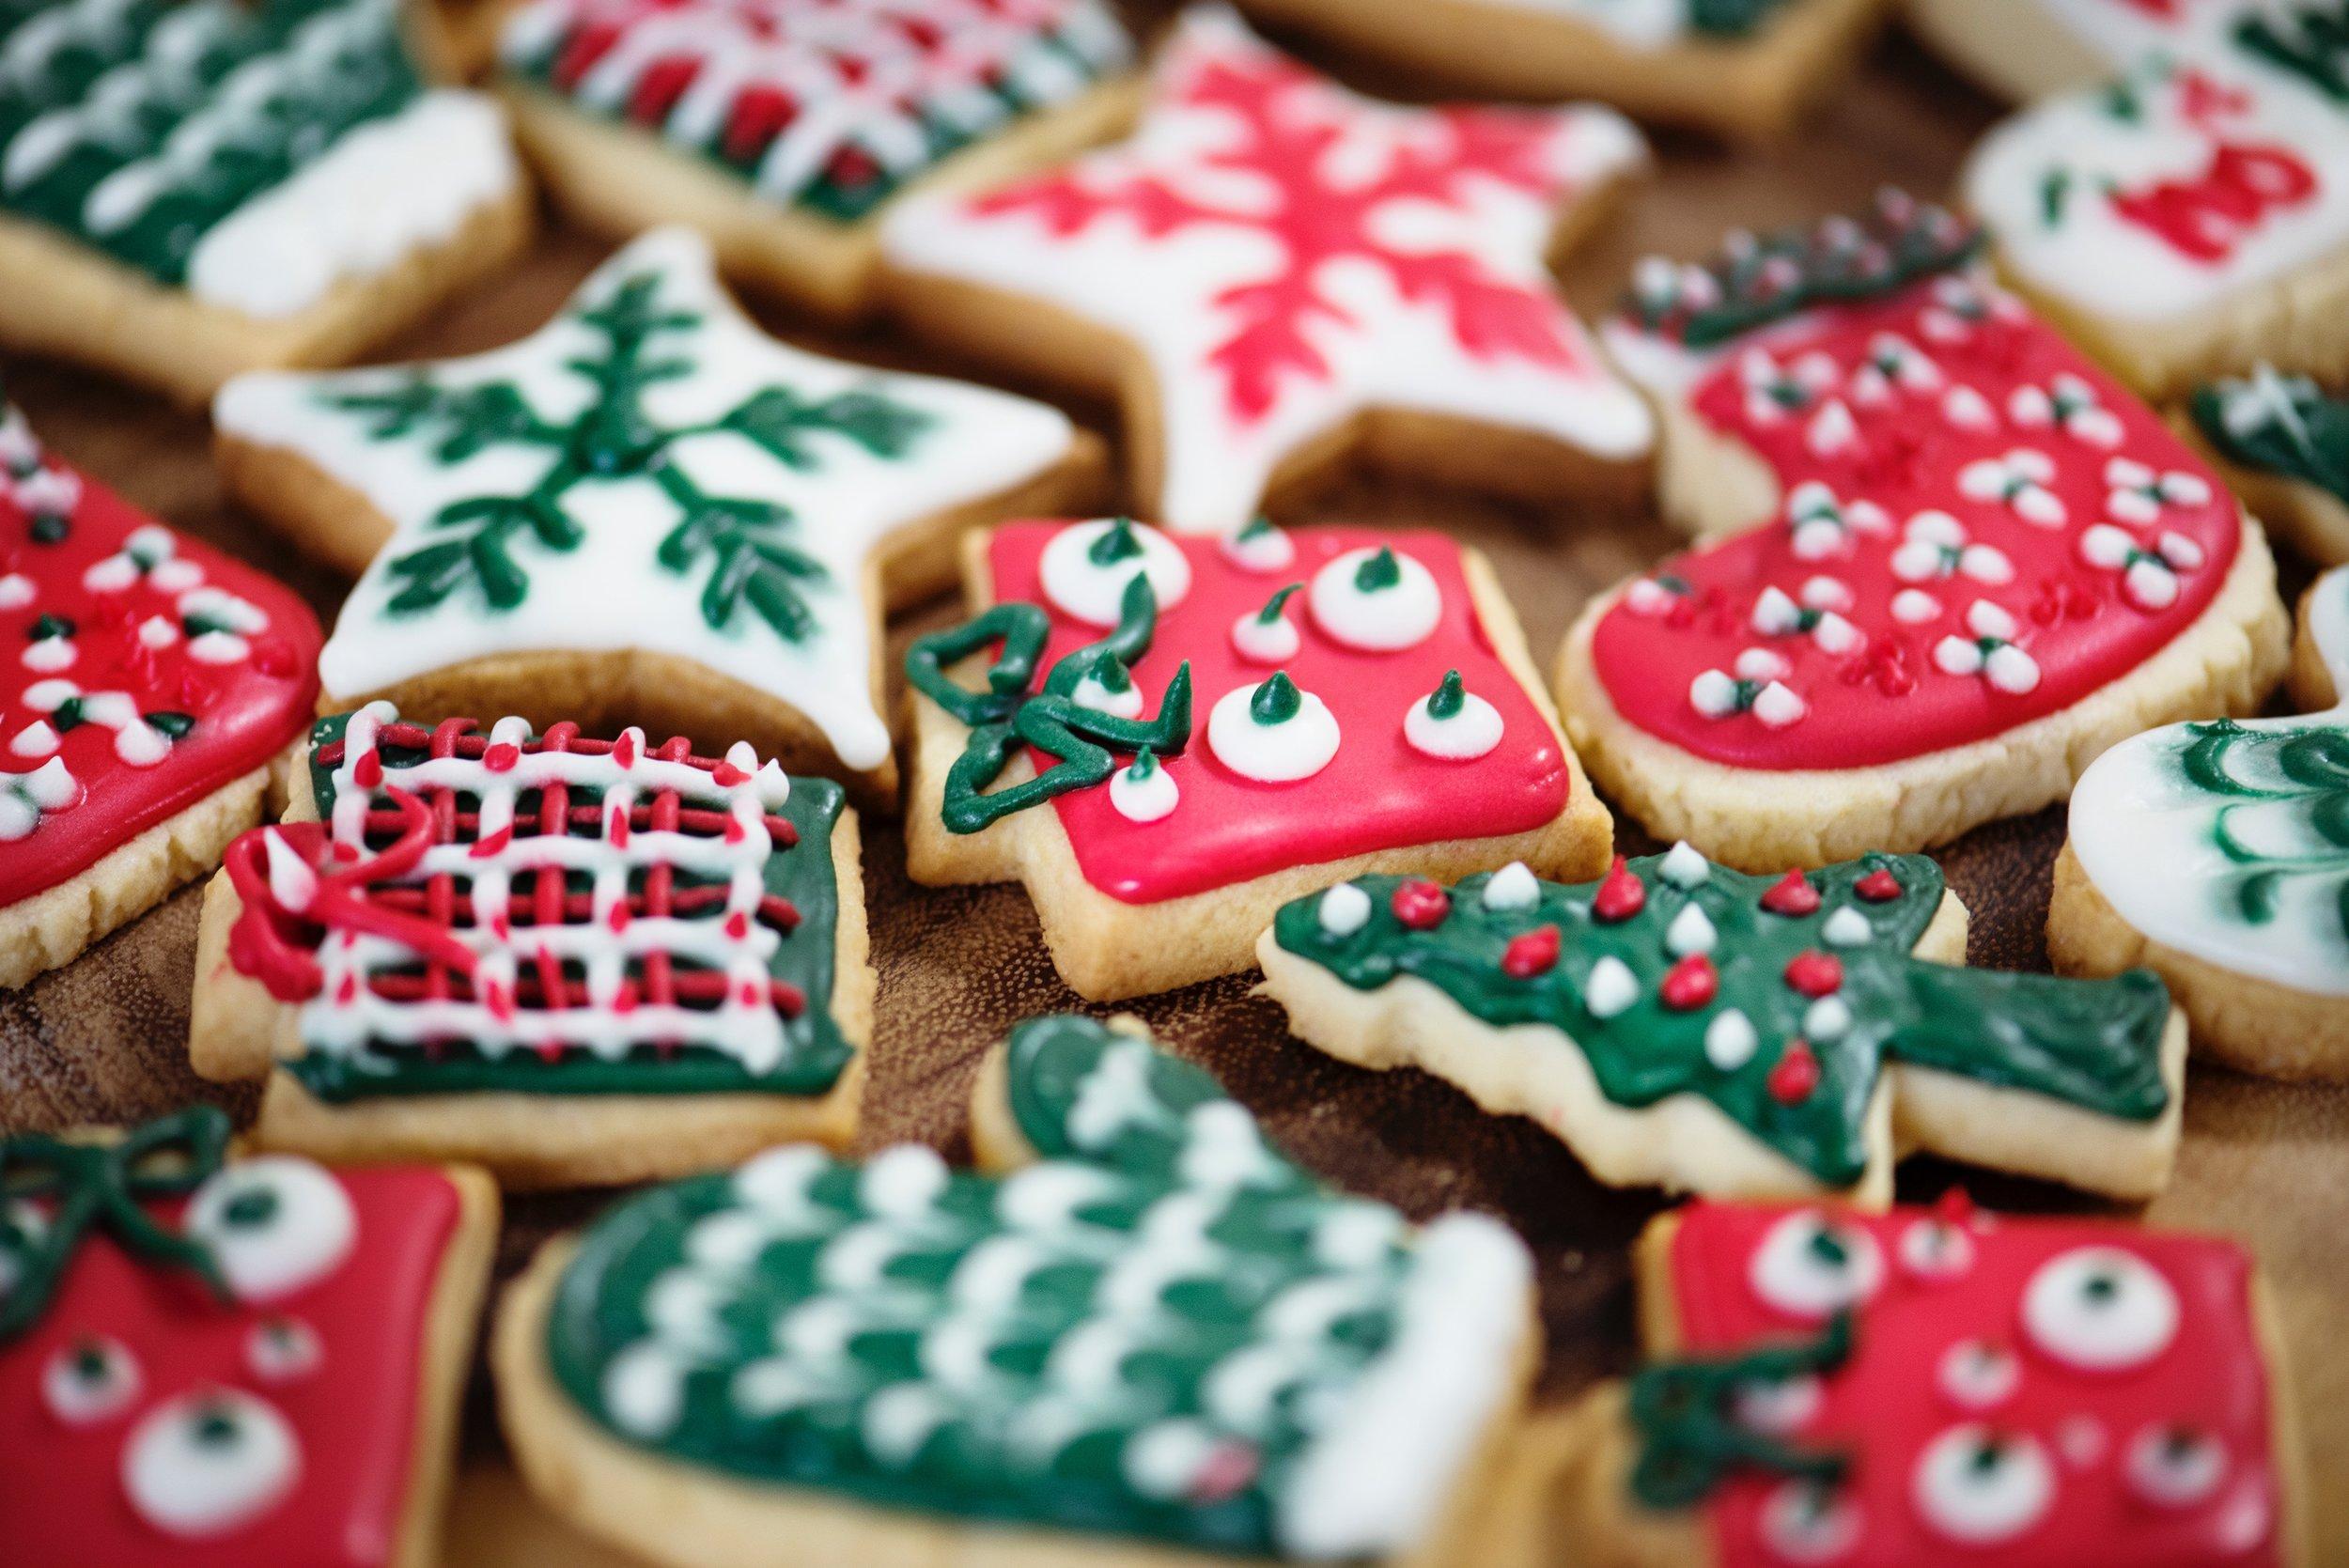 Christmas Sugar Cookie Family Time